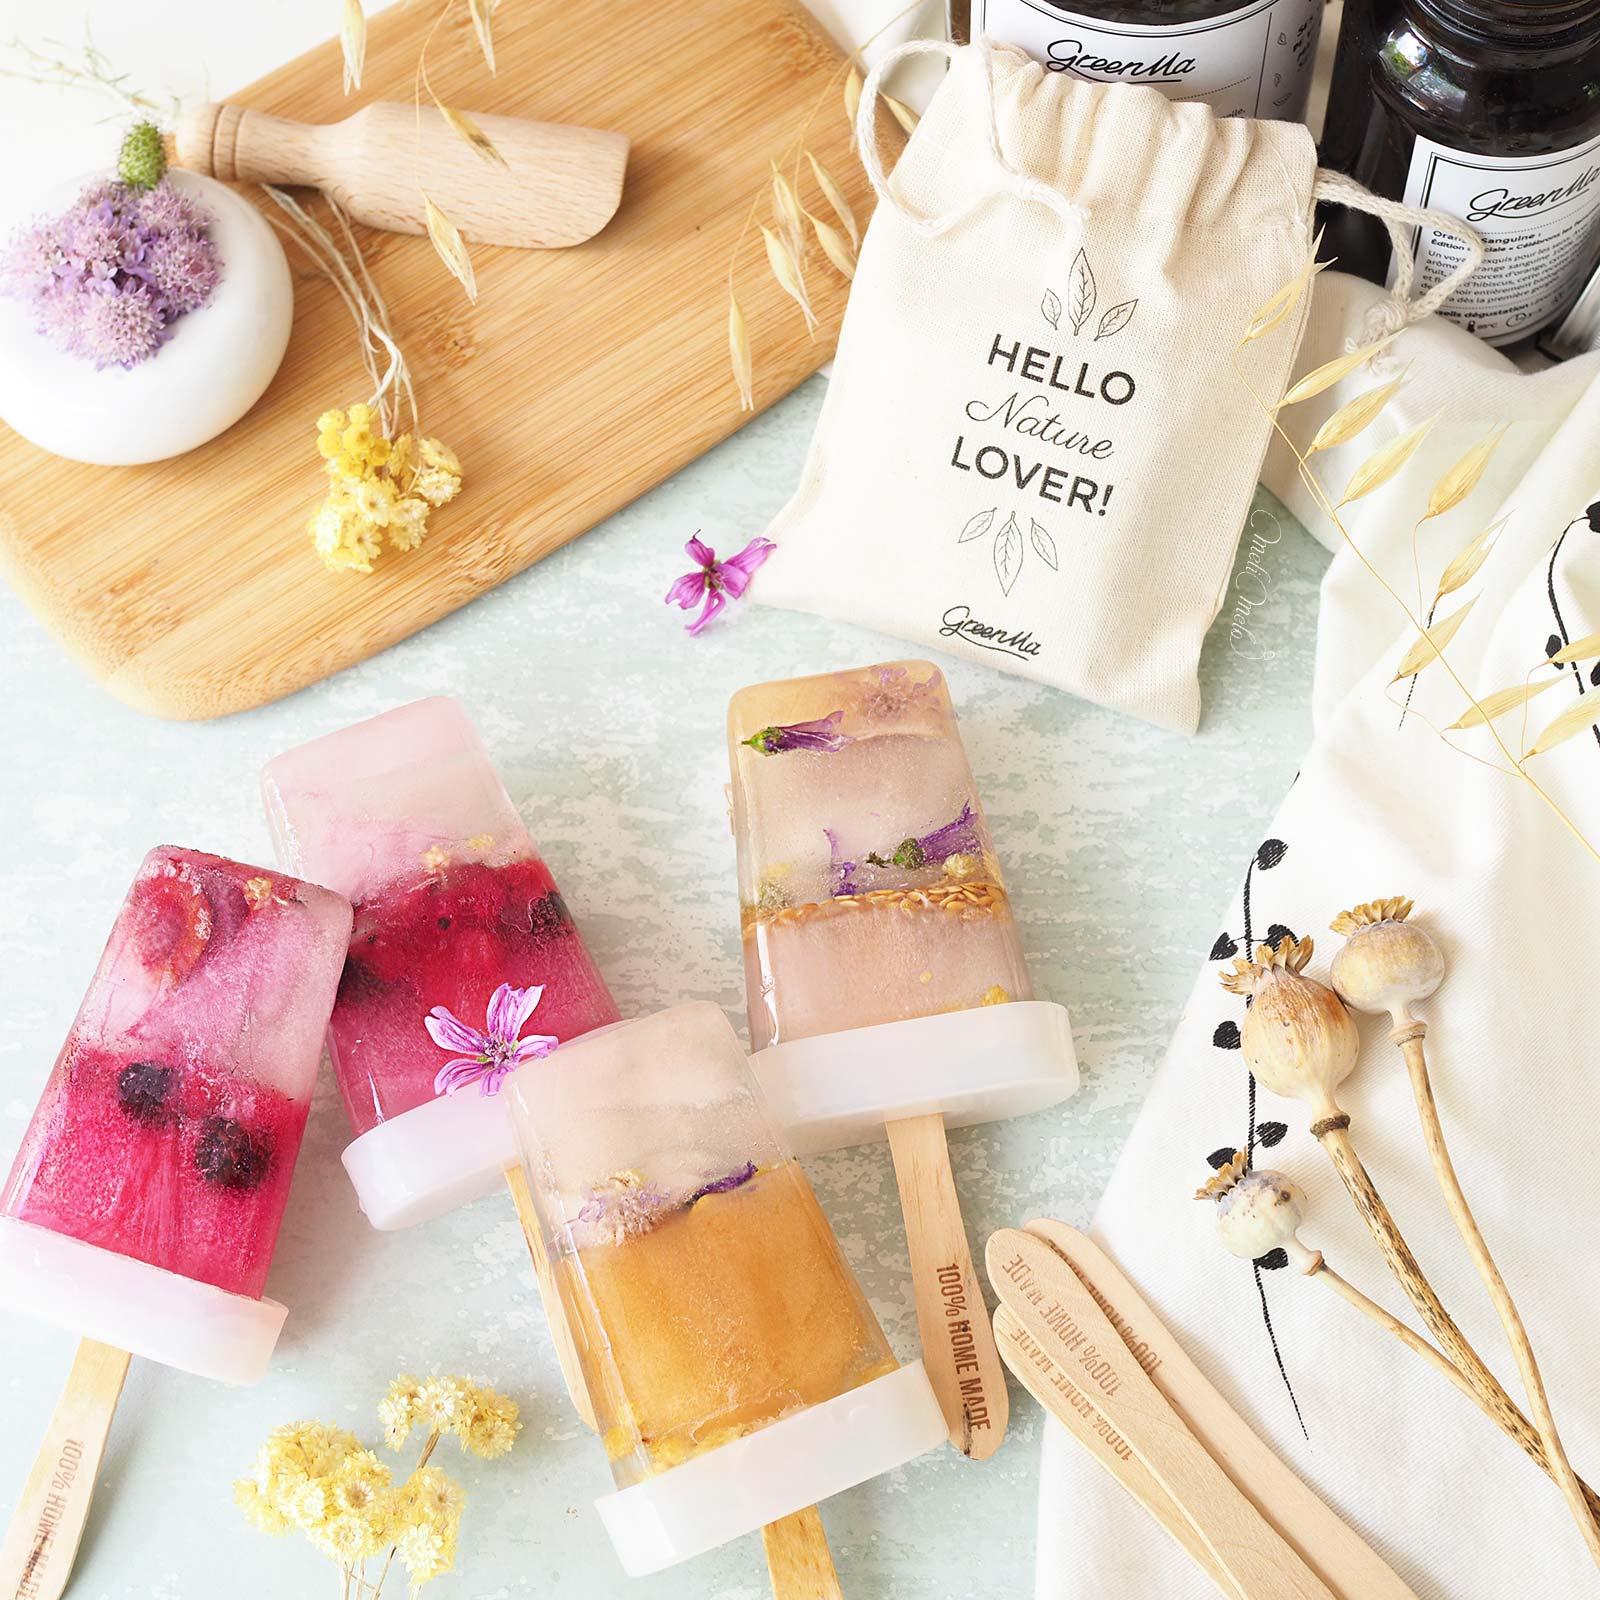 popsicle-glace-fleurs-cerises-the-bio-canneberge-goji-greenma-france-laboutiquedemelimelo